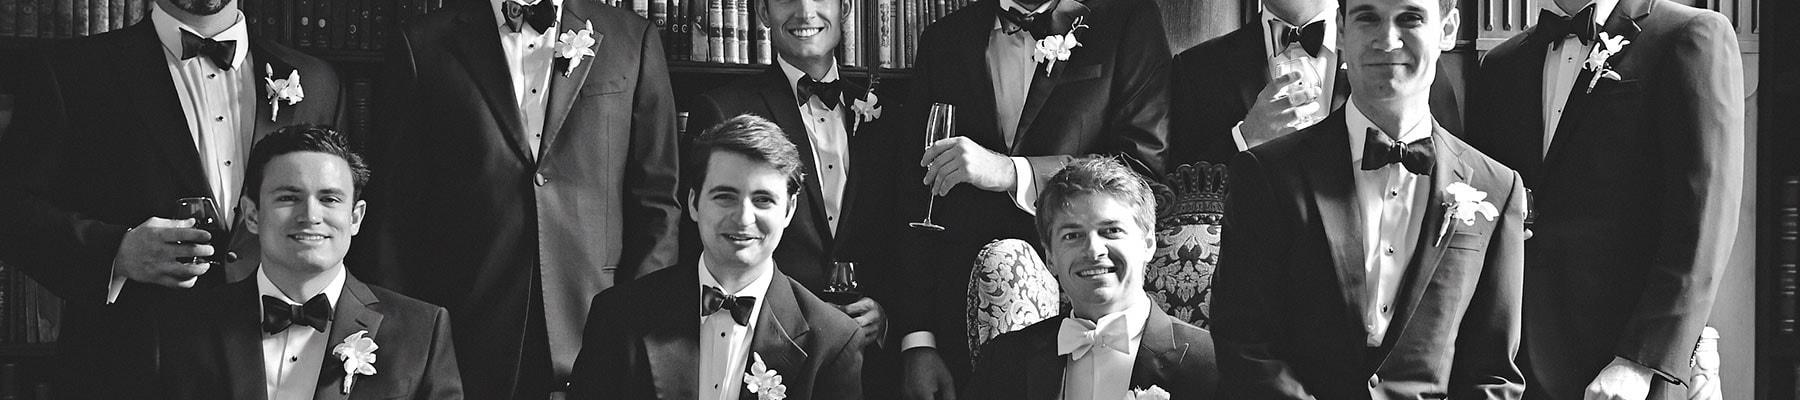 Bryllup på fyn - fotografering- Holckenhavn Slot